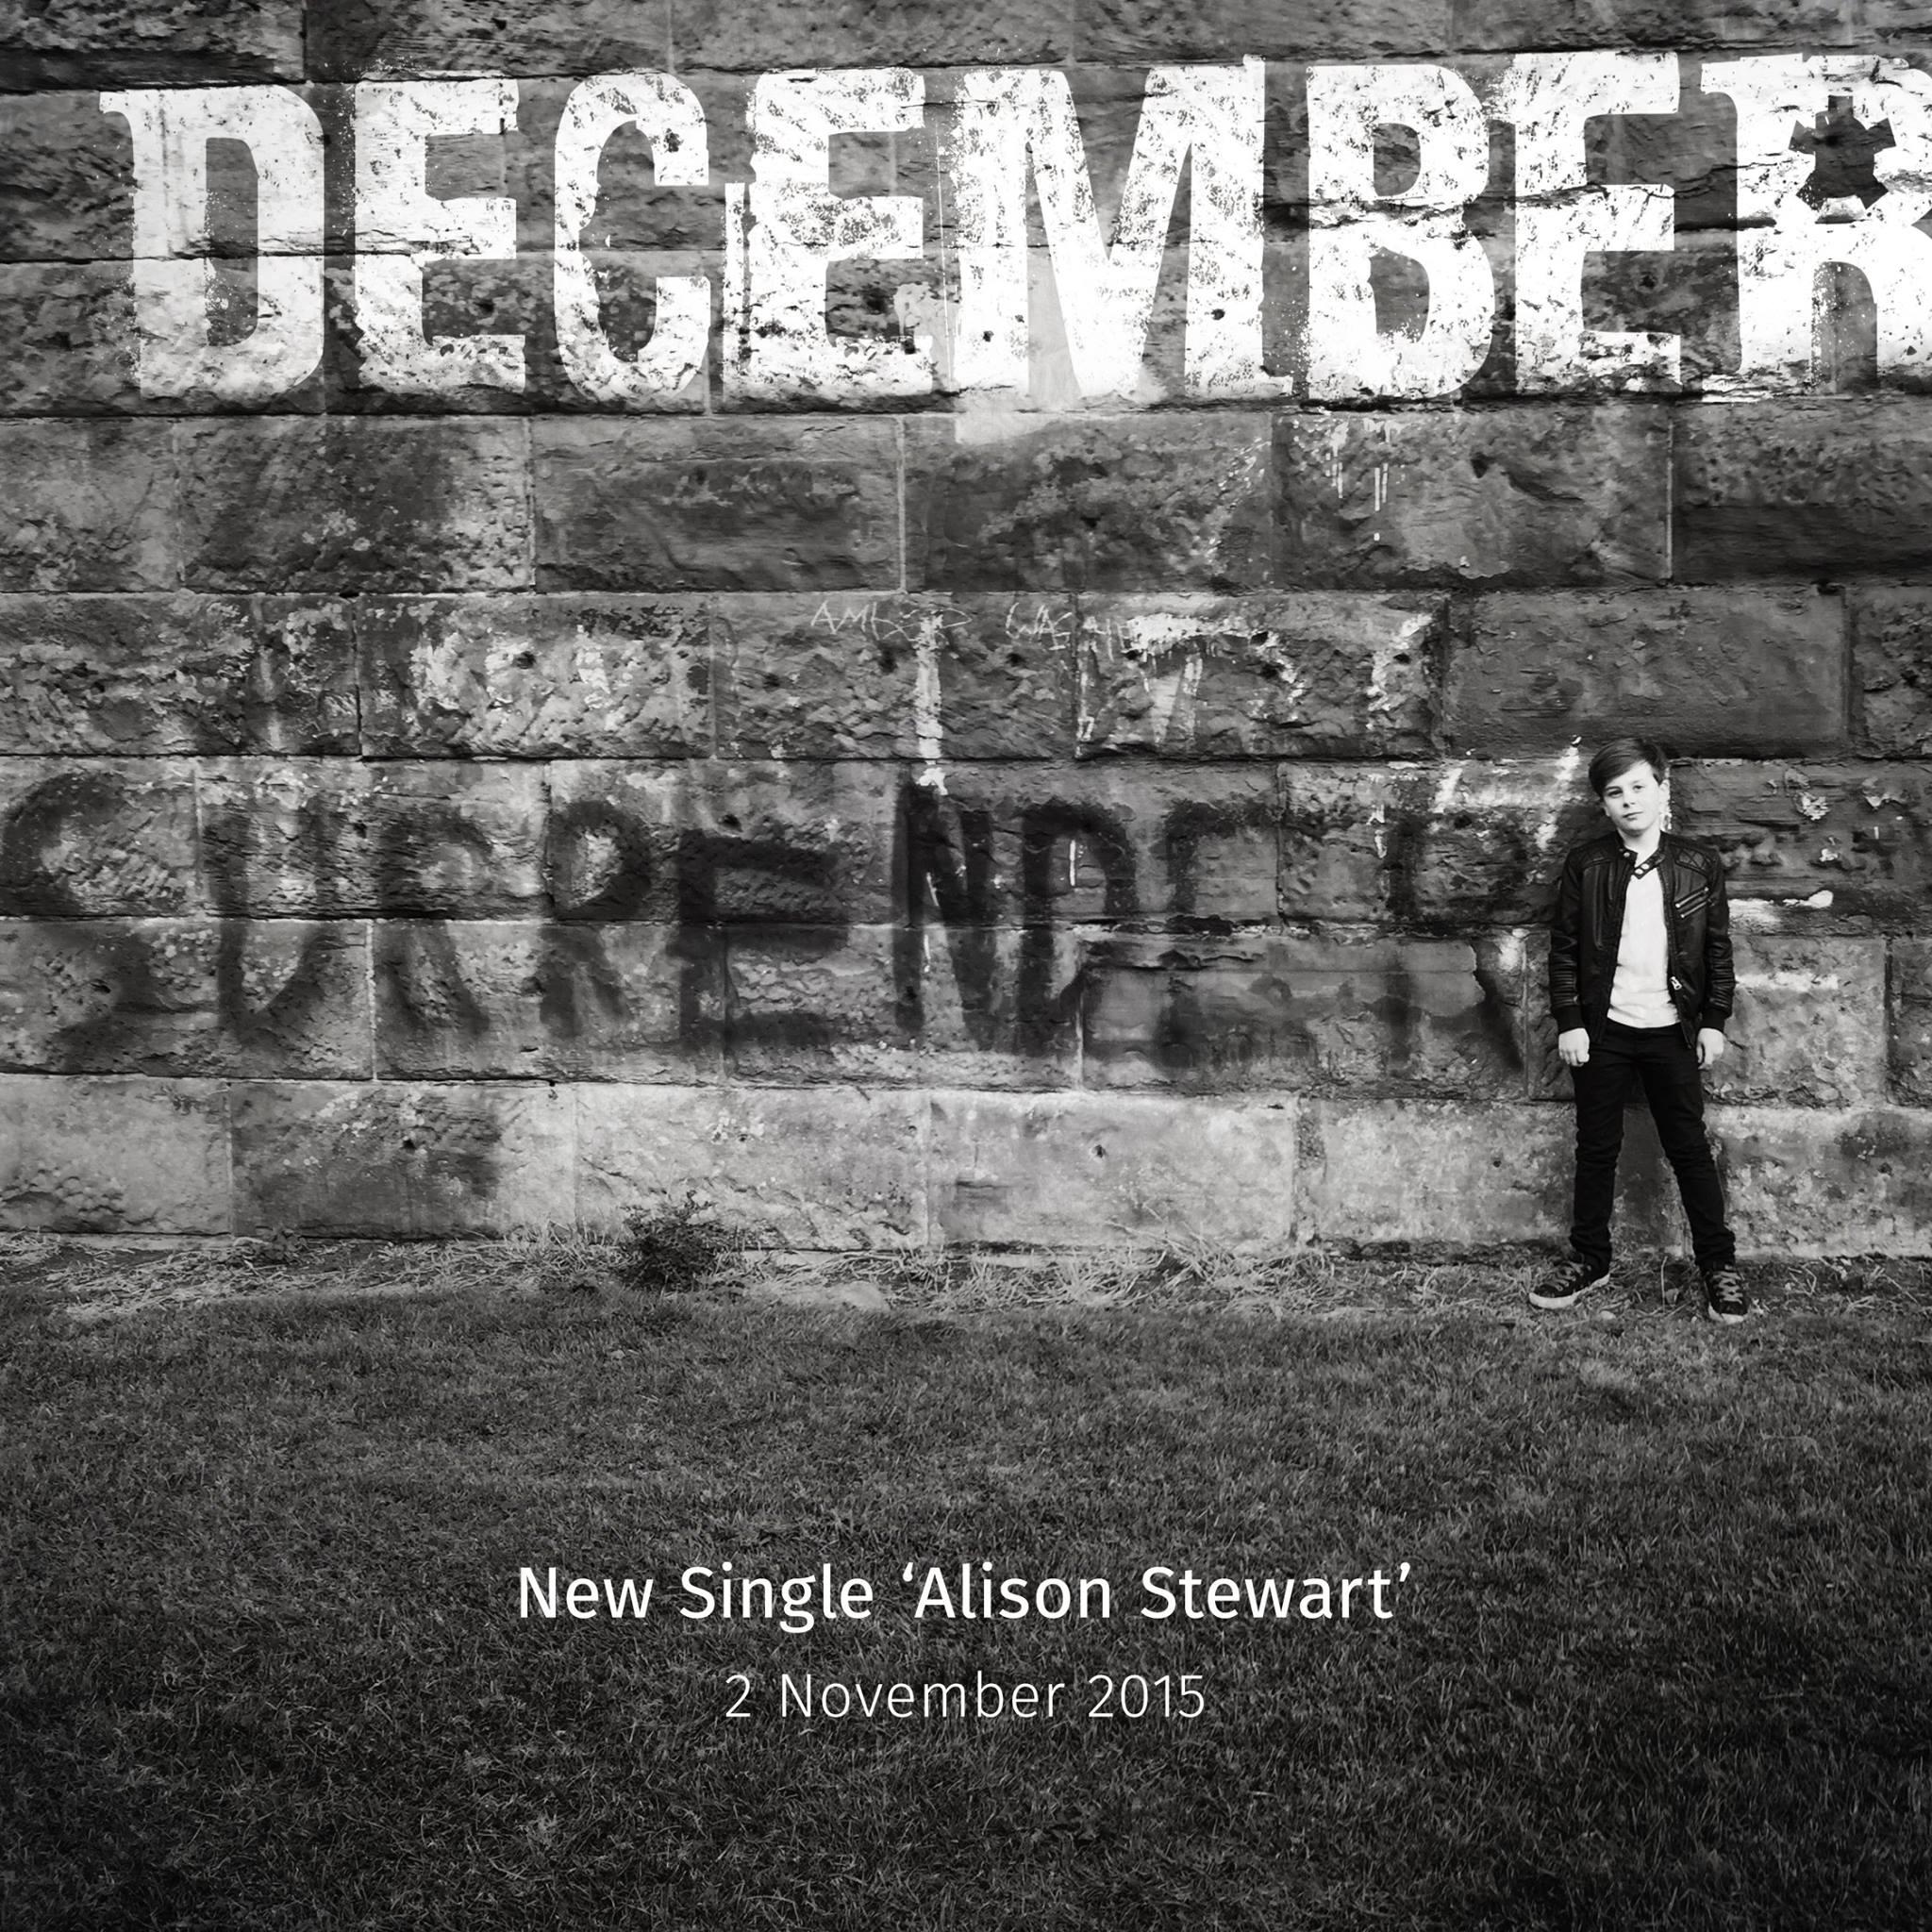 singles in stewart Live music calendar in stuart/ port salerno/ jensen beach/ martin county florida area.